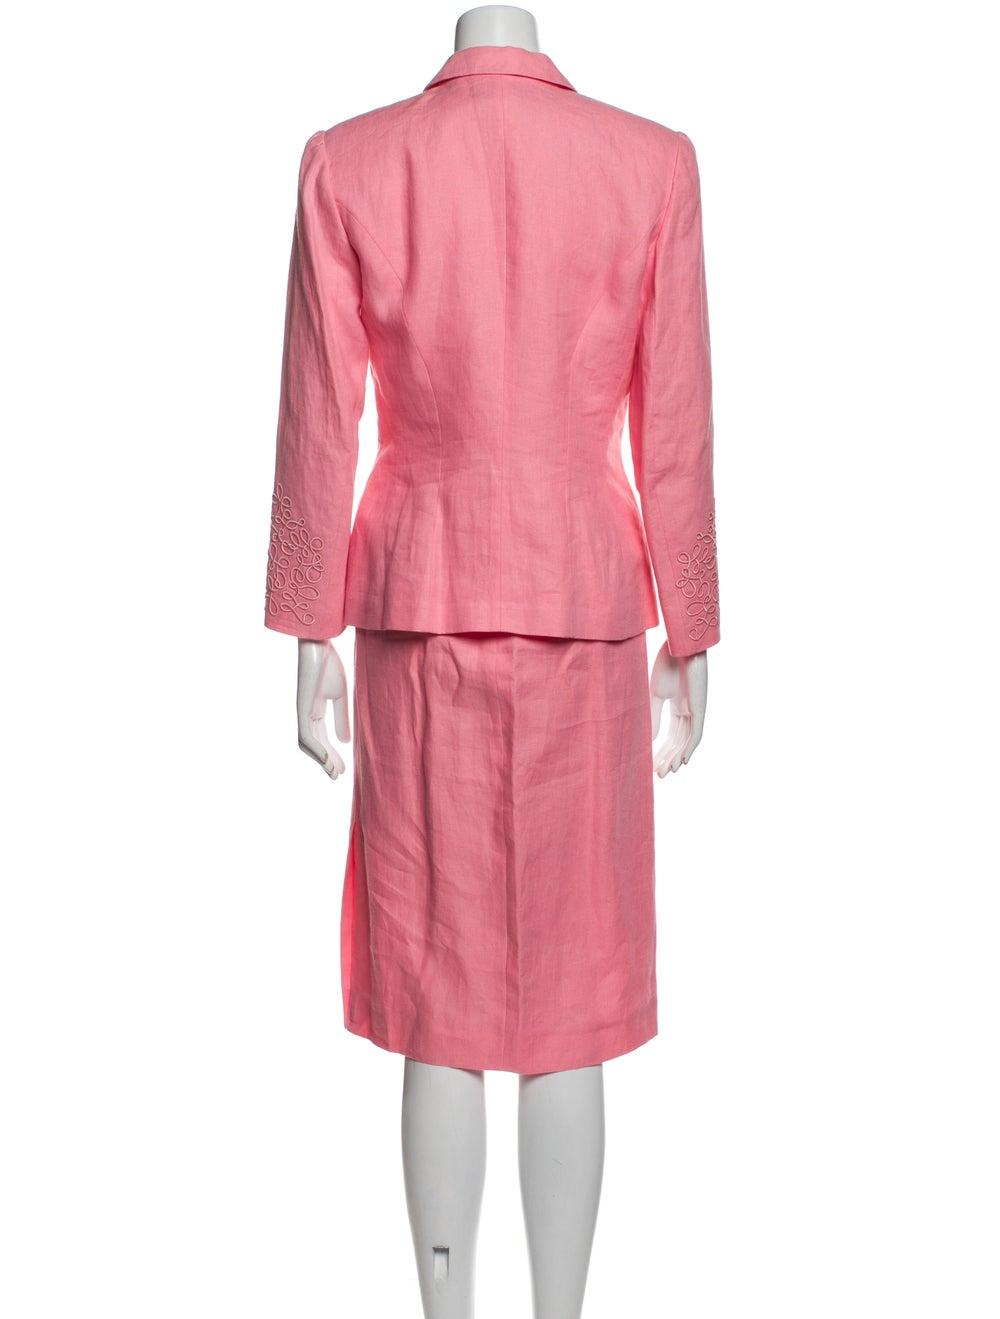 Kenzo Vintage Linen Skirt Suit Pink - image 3